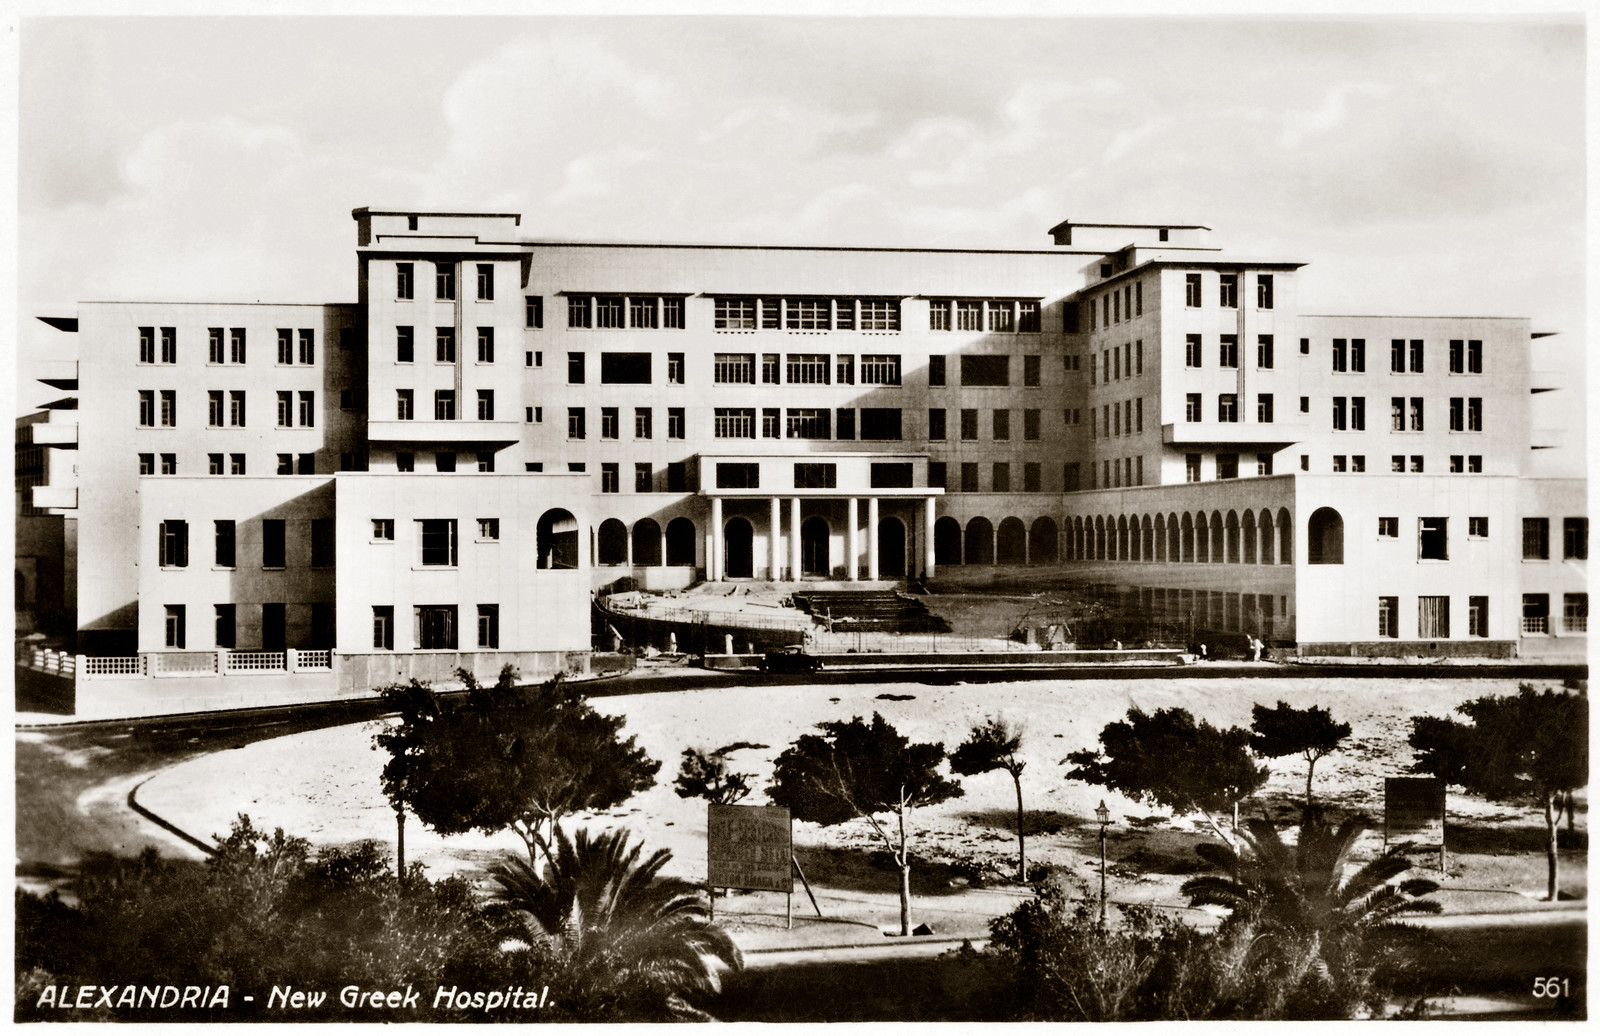 24 Mar 1941 - No. 561 'ALEXANDRIA - New Greek Hospital', Egypt(real photo postcard, circa 1930s)